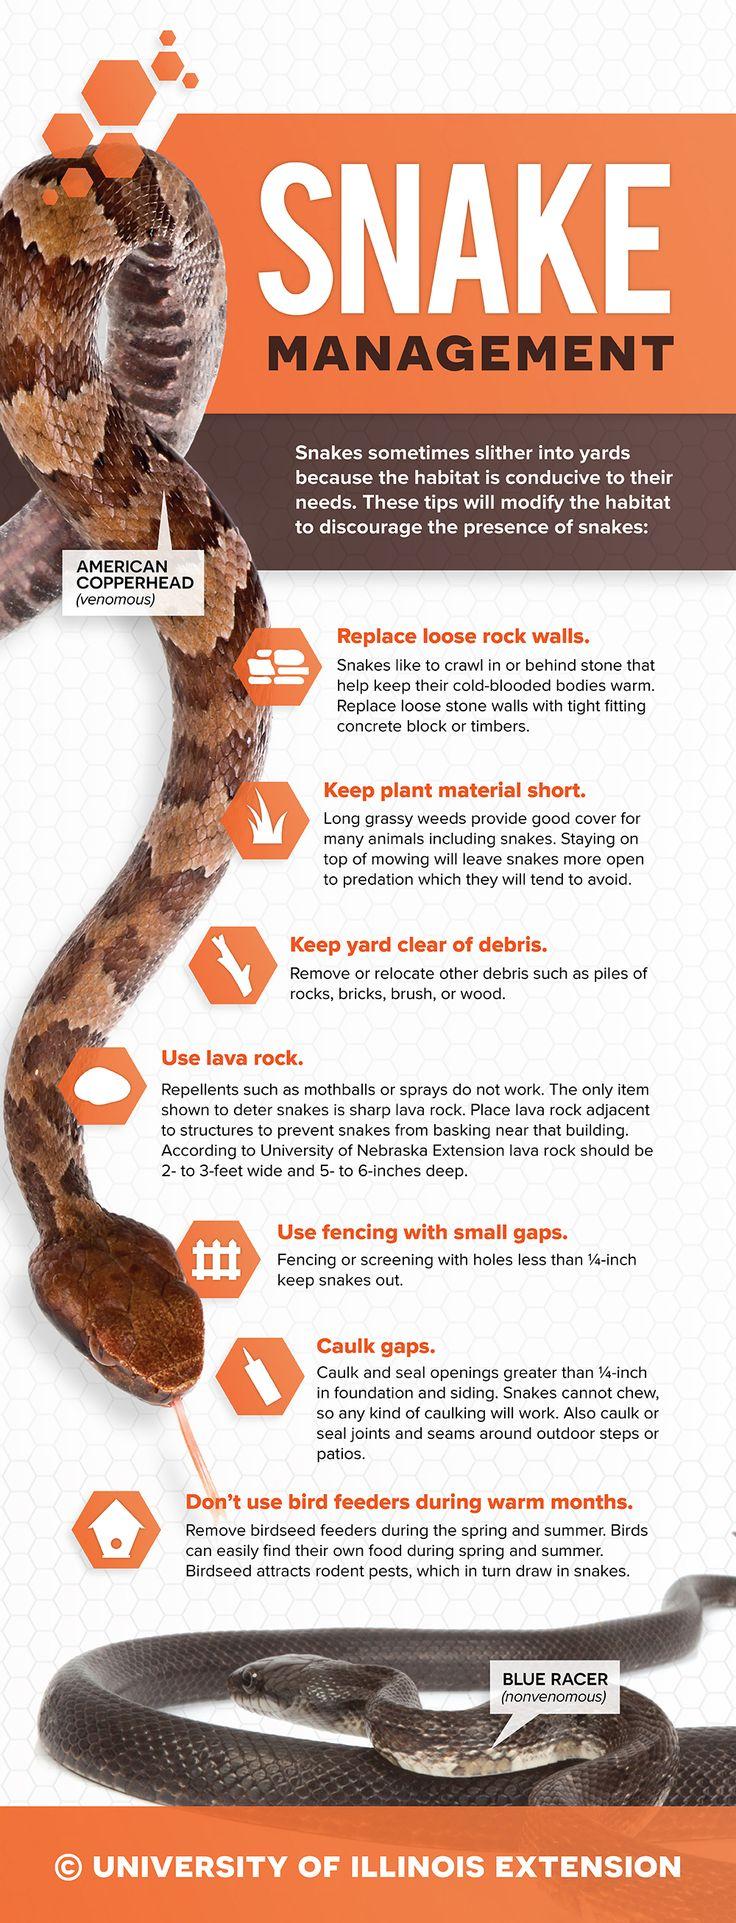 snake management tips